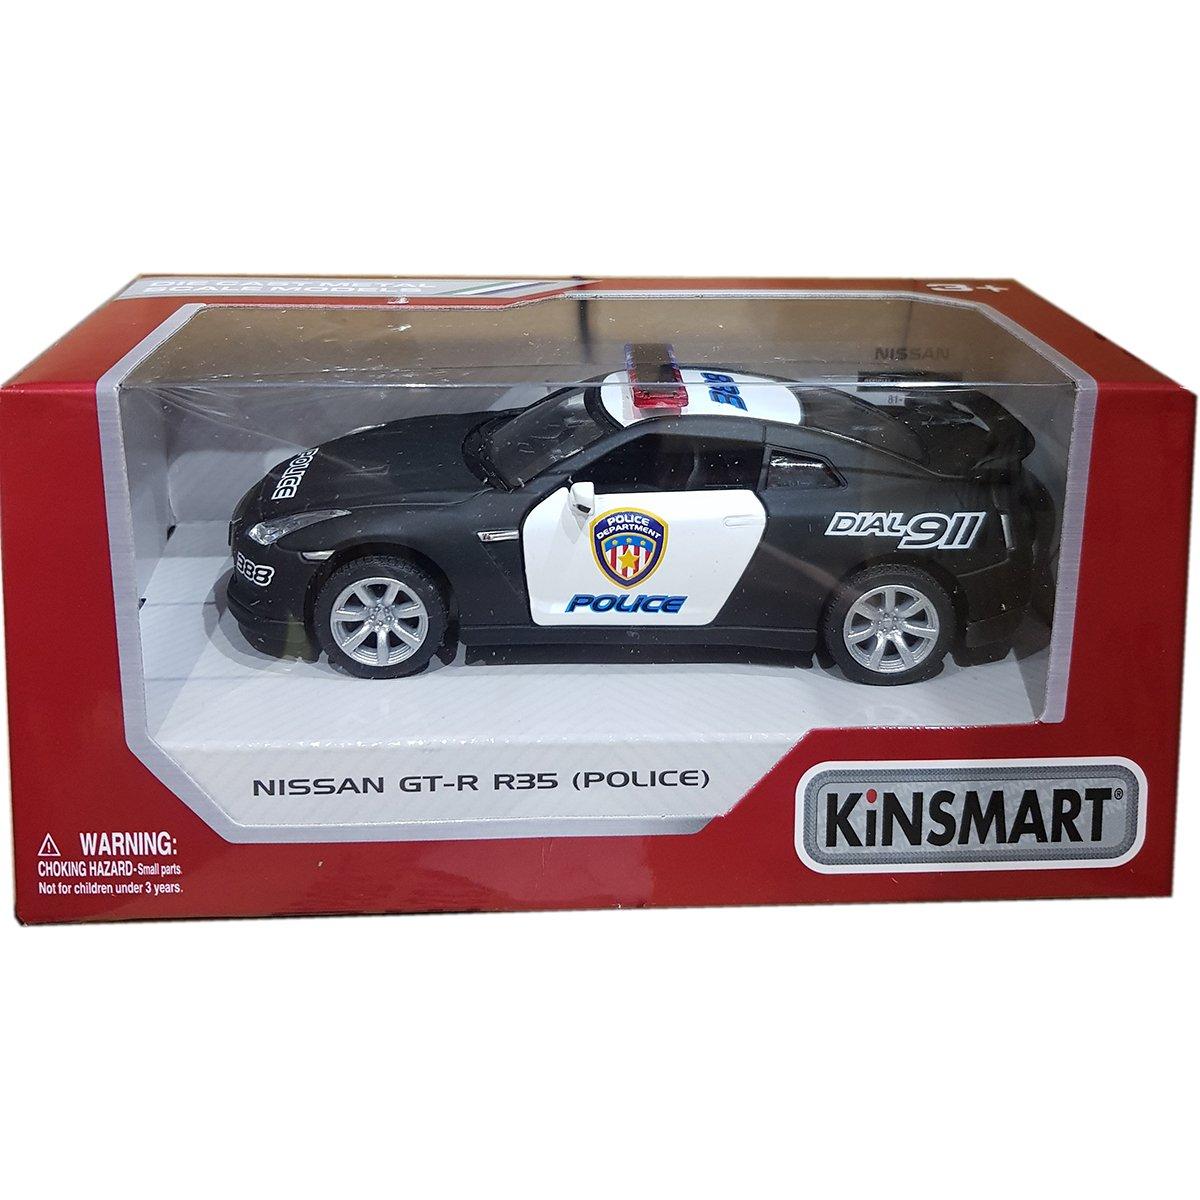 Masinuta metalica de politie Kinsmart, Nissan GT-R R35 imagine